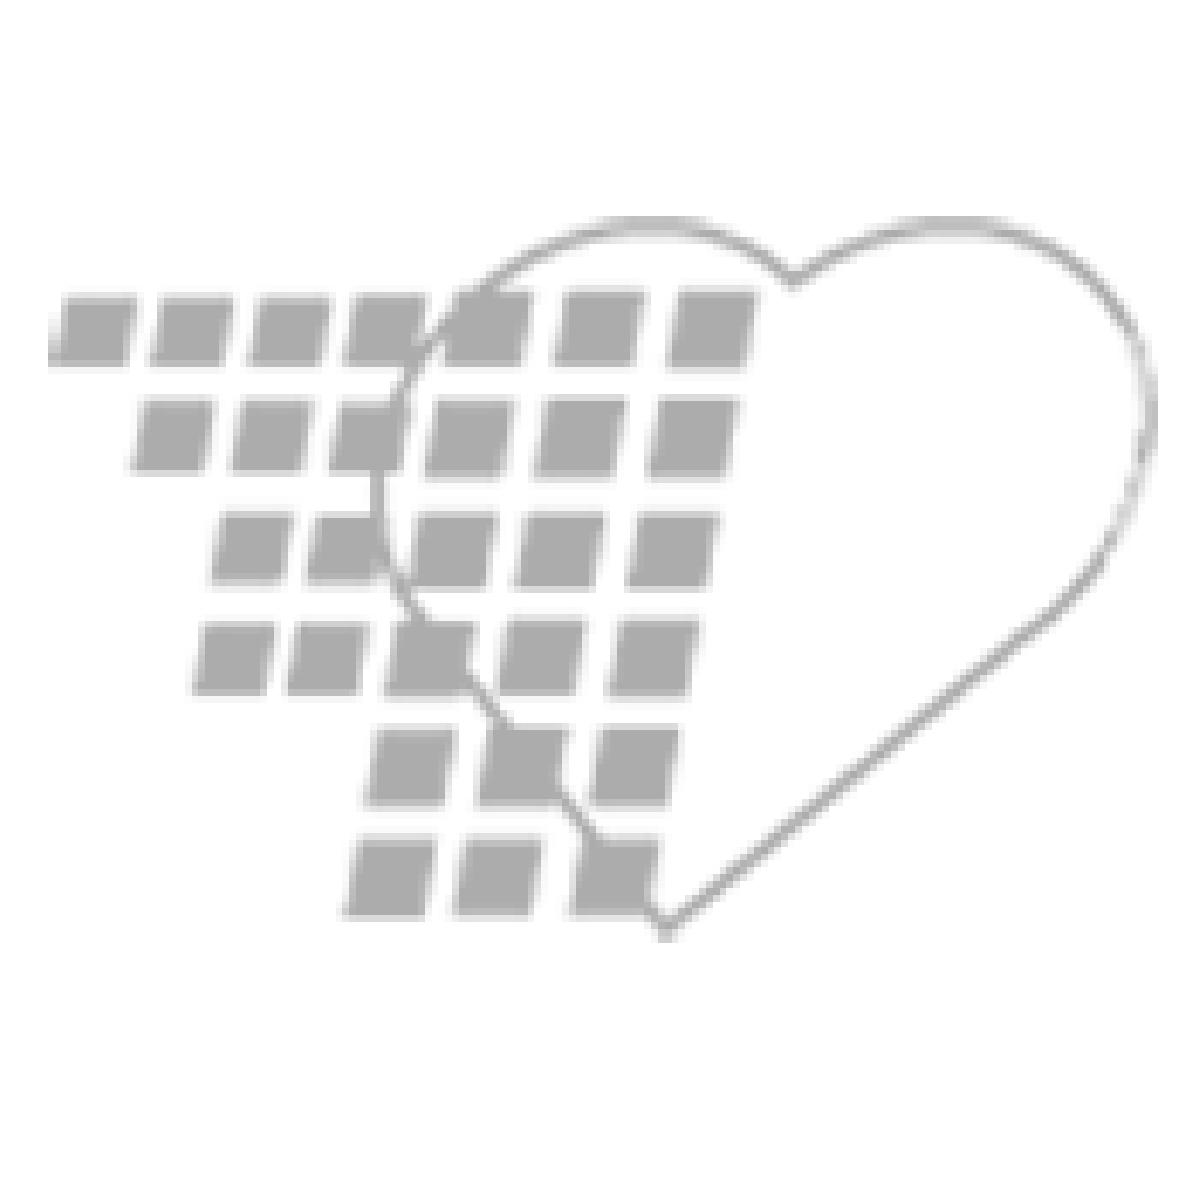 06-93-0426 Demo Dose® 10% Lipids IV Fluid 500 mL